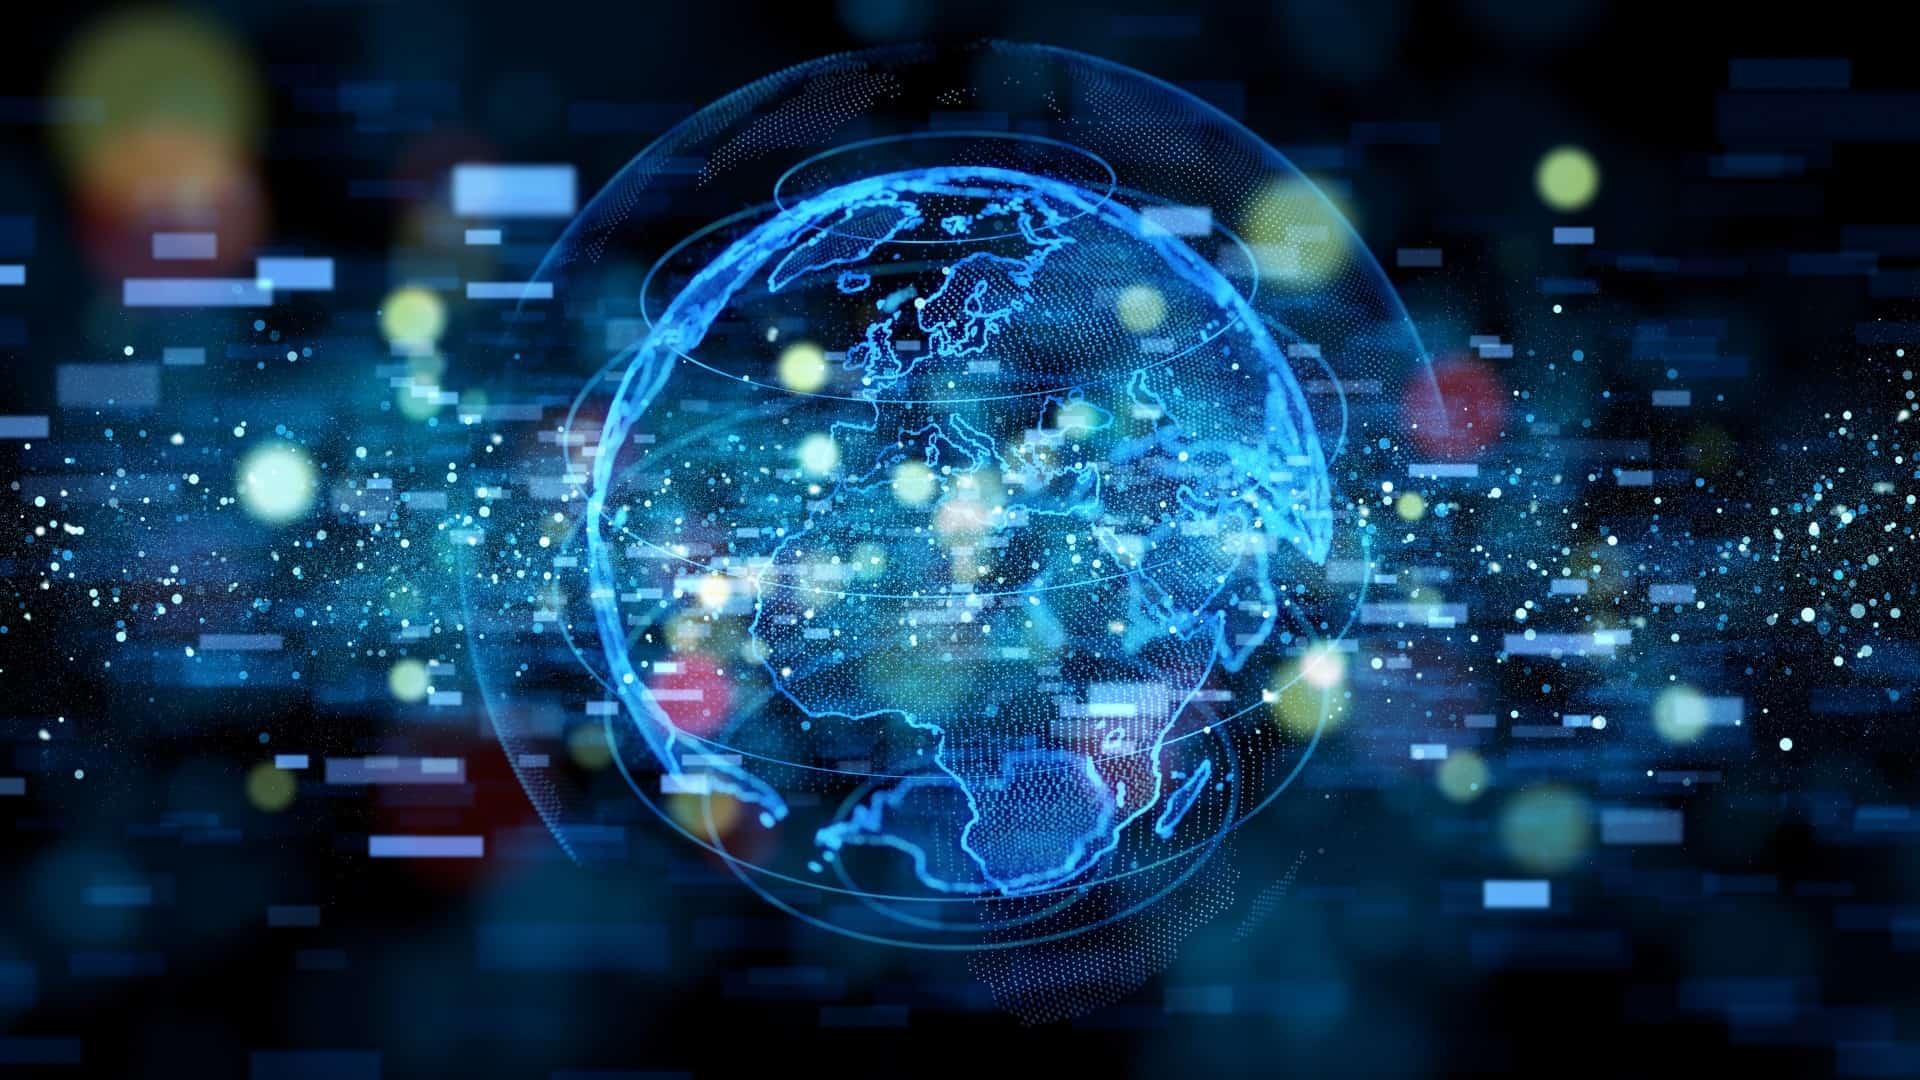 Globe tech image